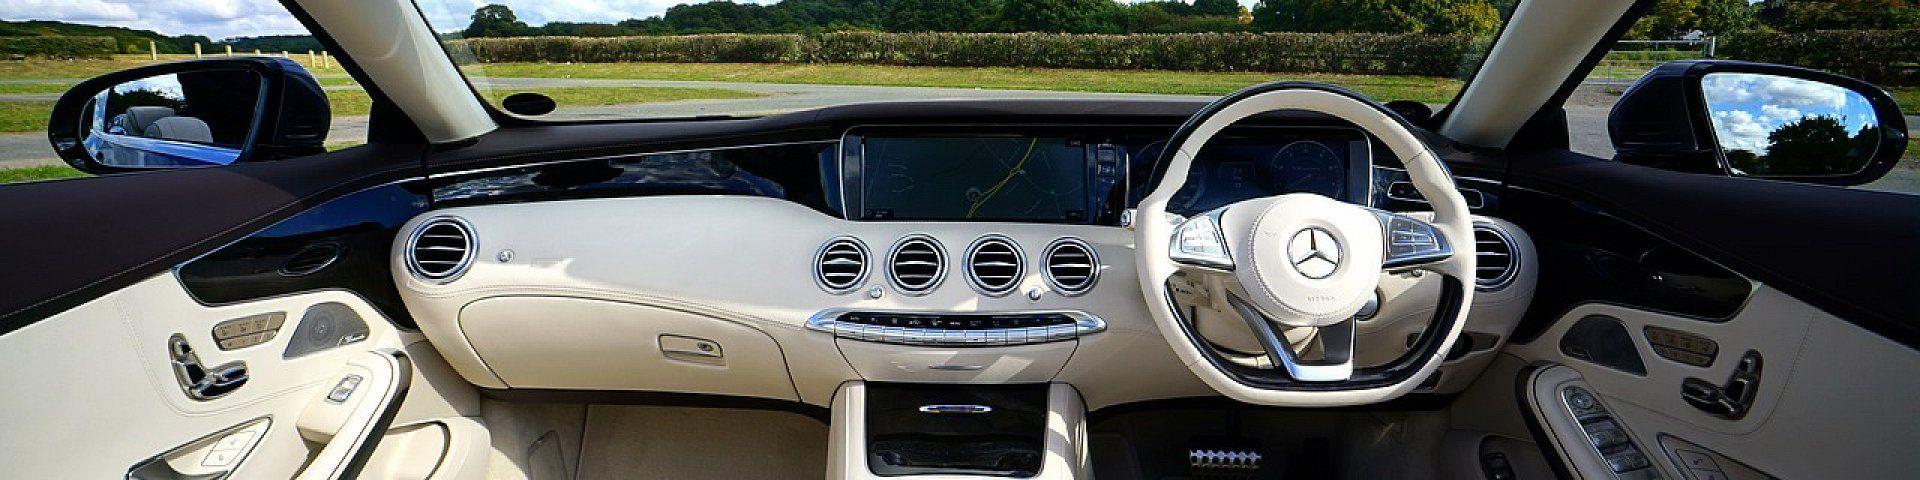 Luxury Car Rental Or Leasing In Bangkok Thailand At Best Price Luxury Car Rental Car Rental Luxury Cars